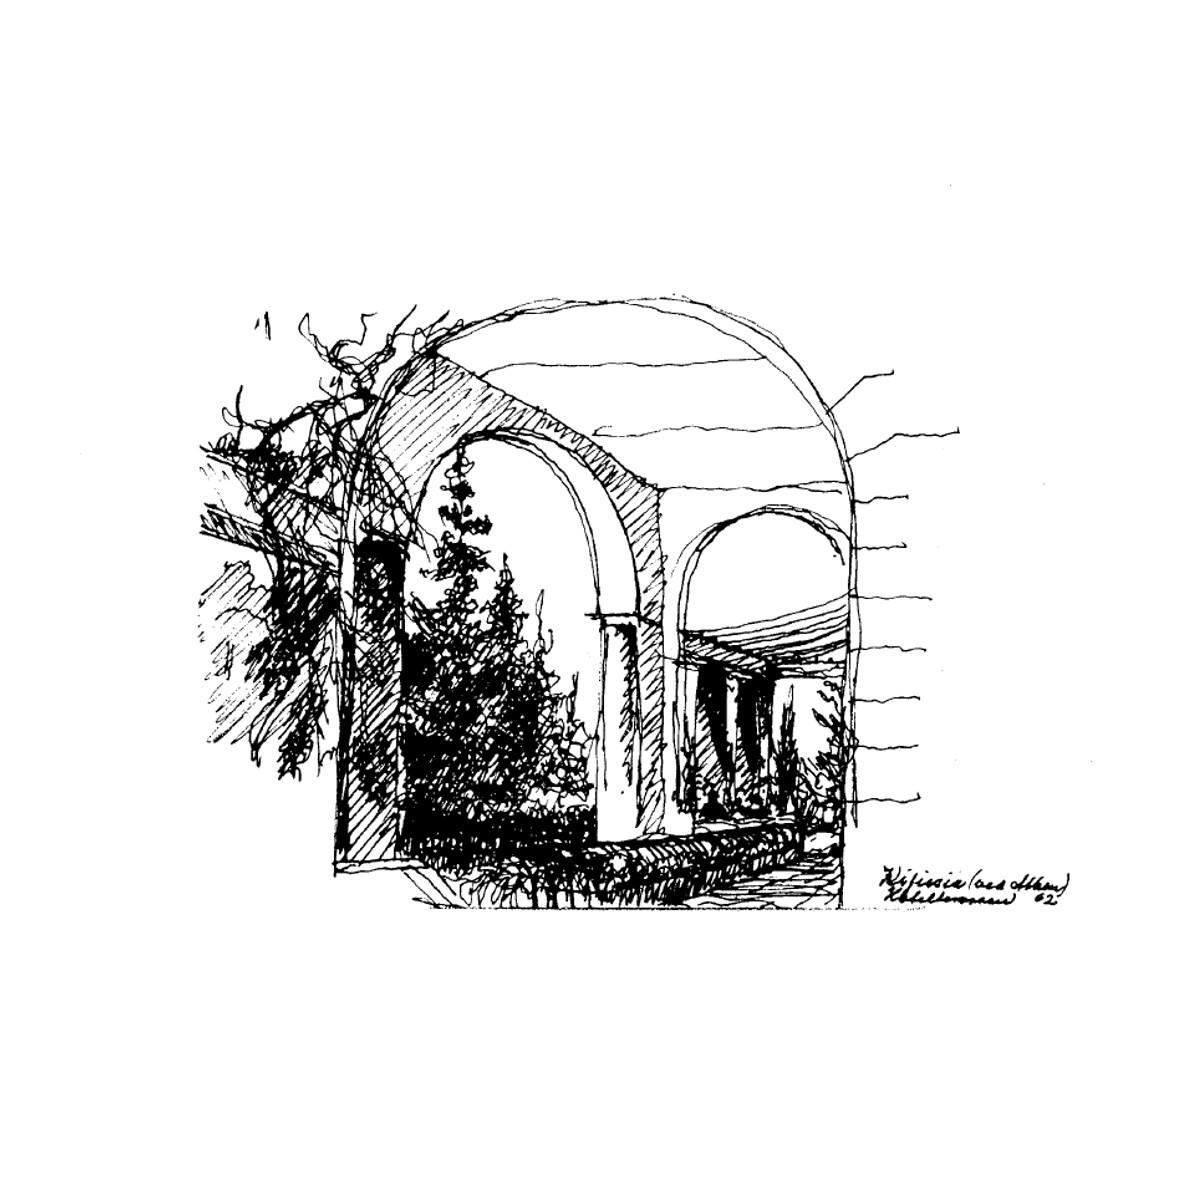 Arne Jacobsen: Dibujos 1958-1965 |Arquetipos